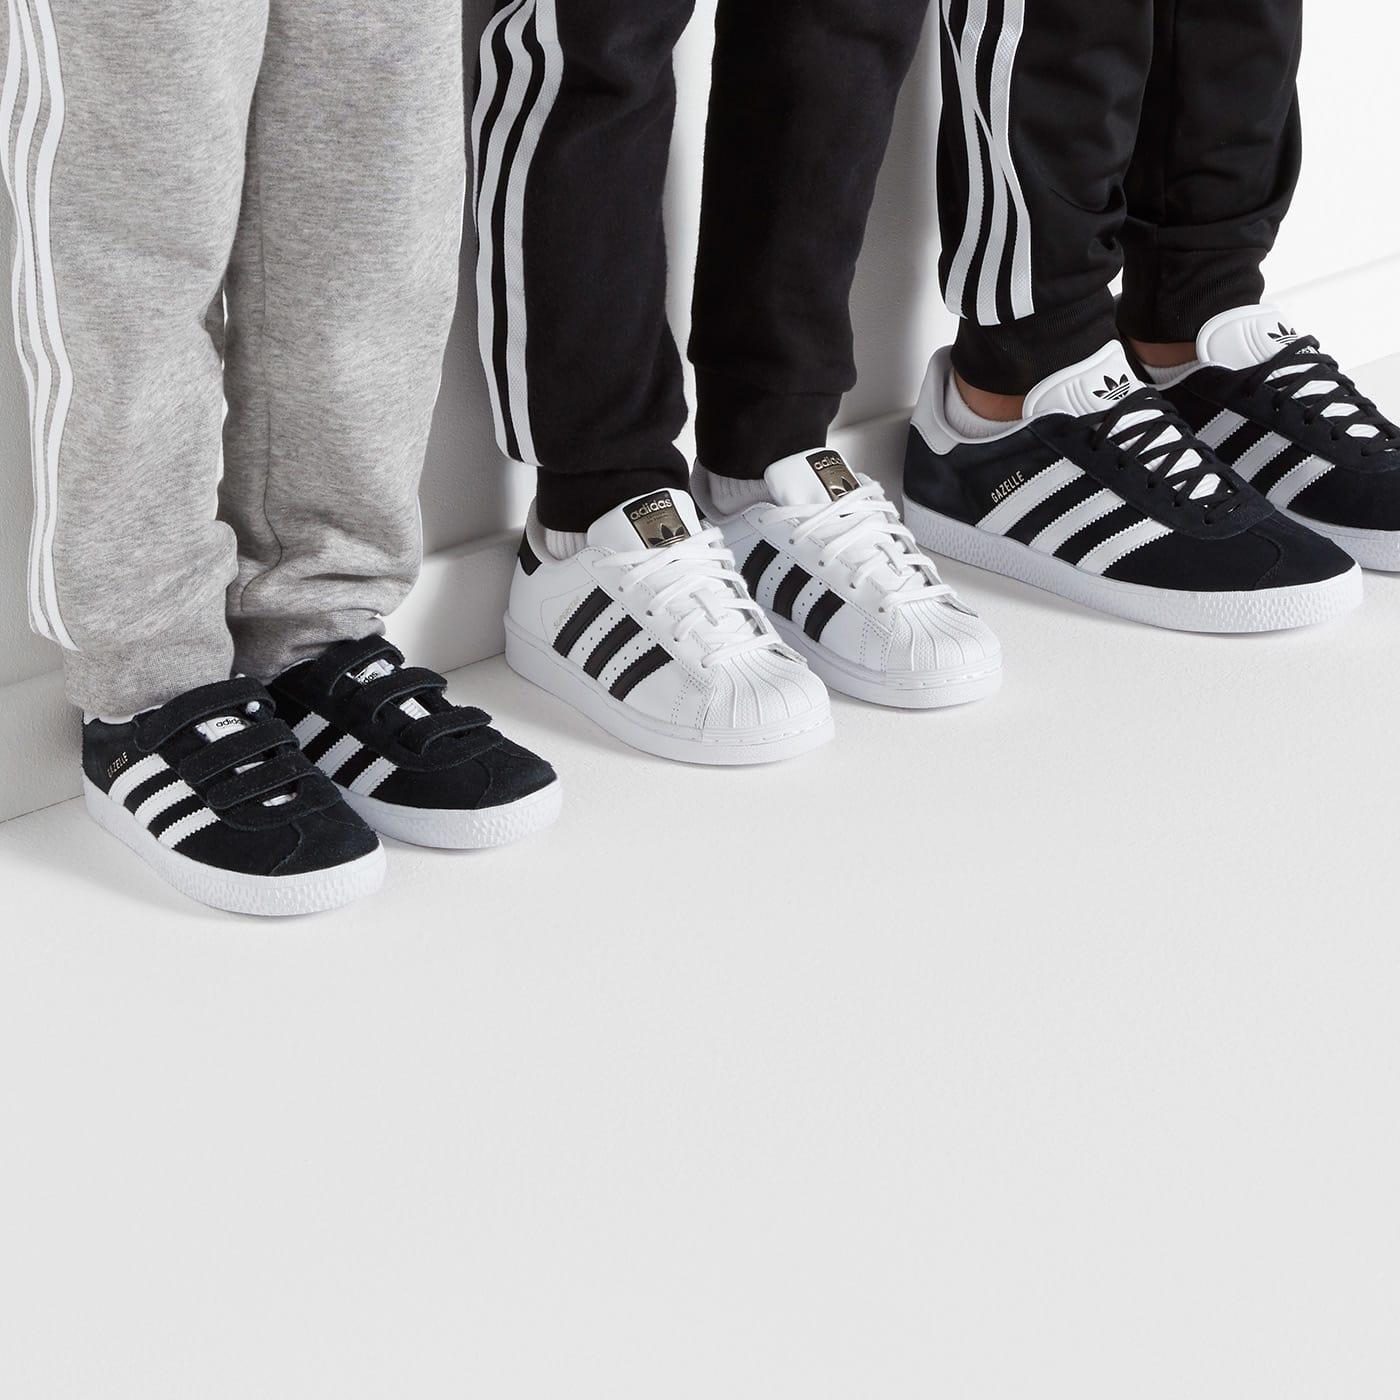 Adidas Officielle Chaussures Fille Boutique Chaussures Fille wqrXxIr